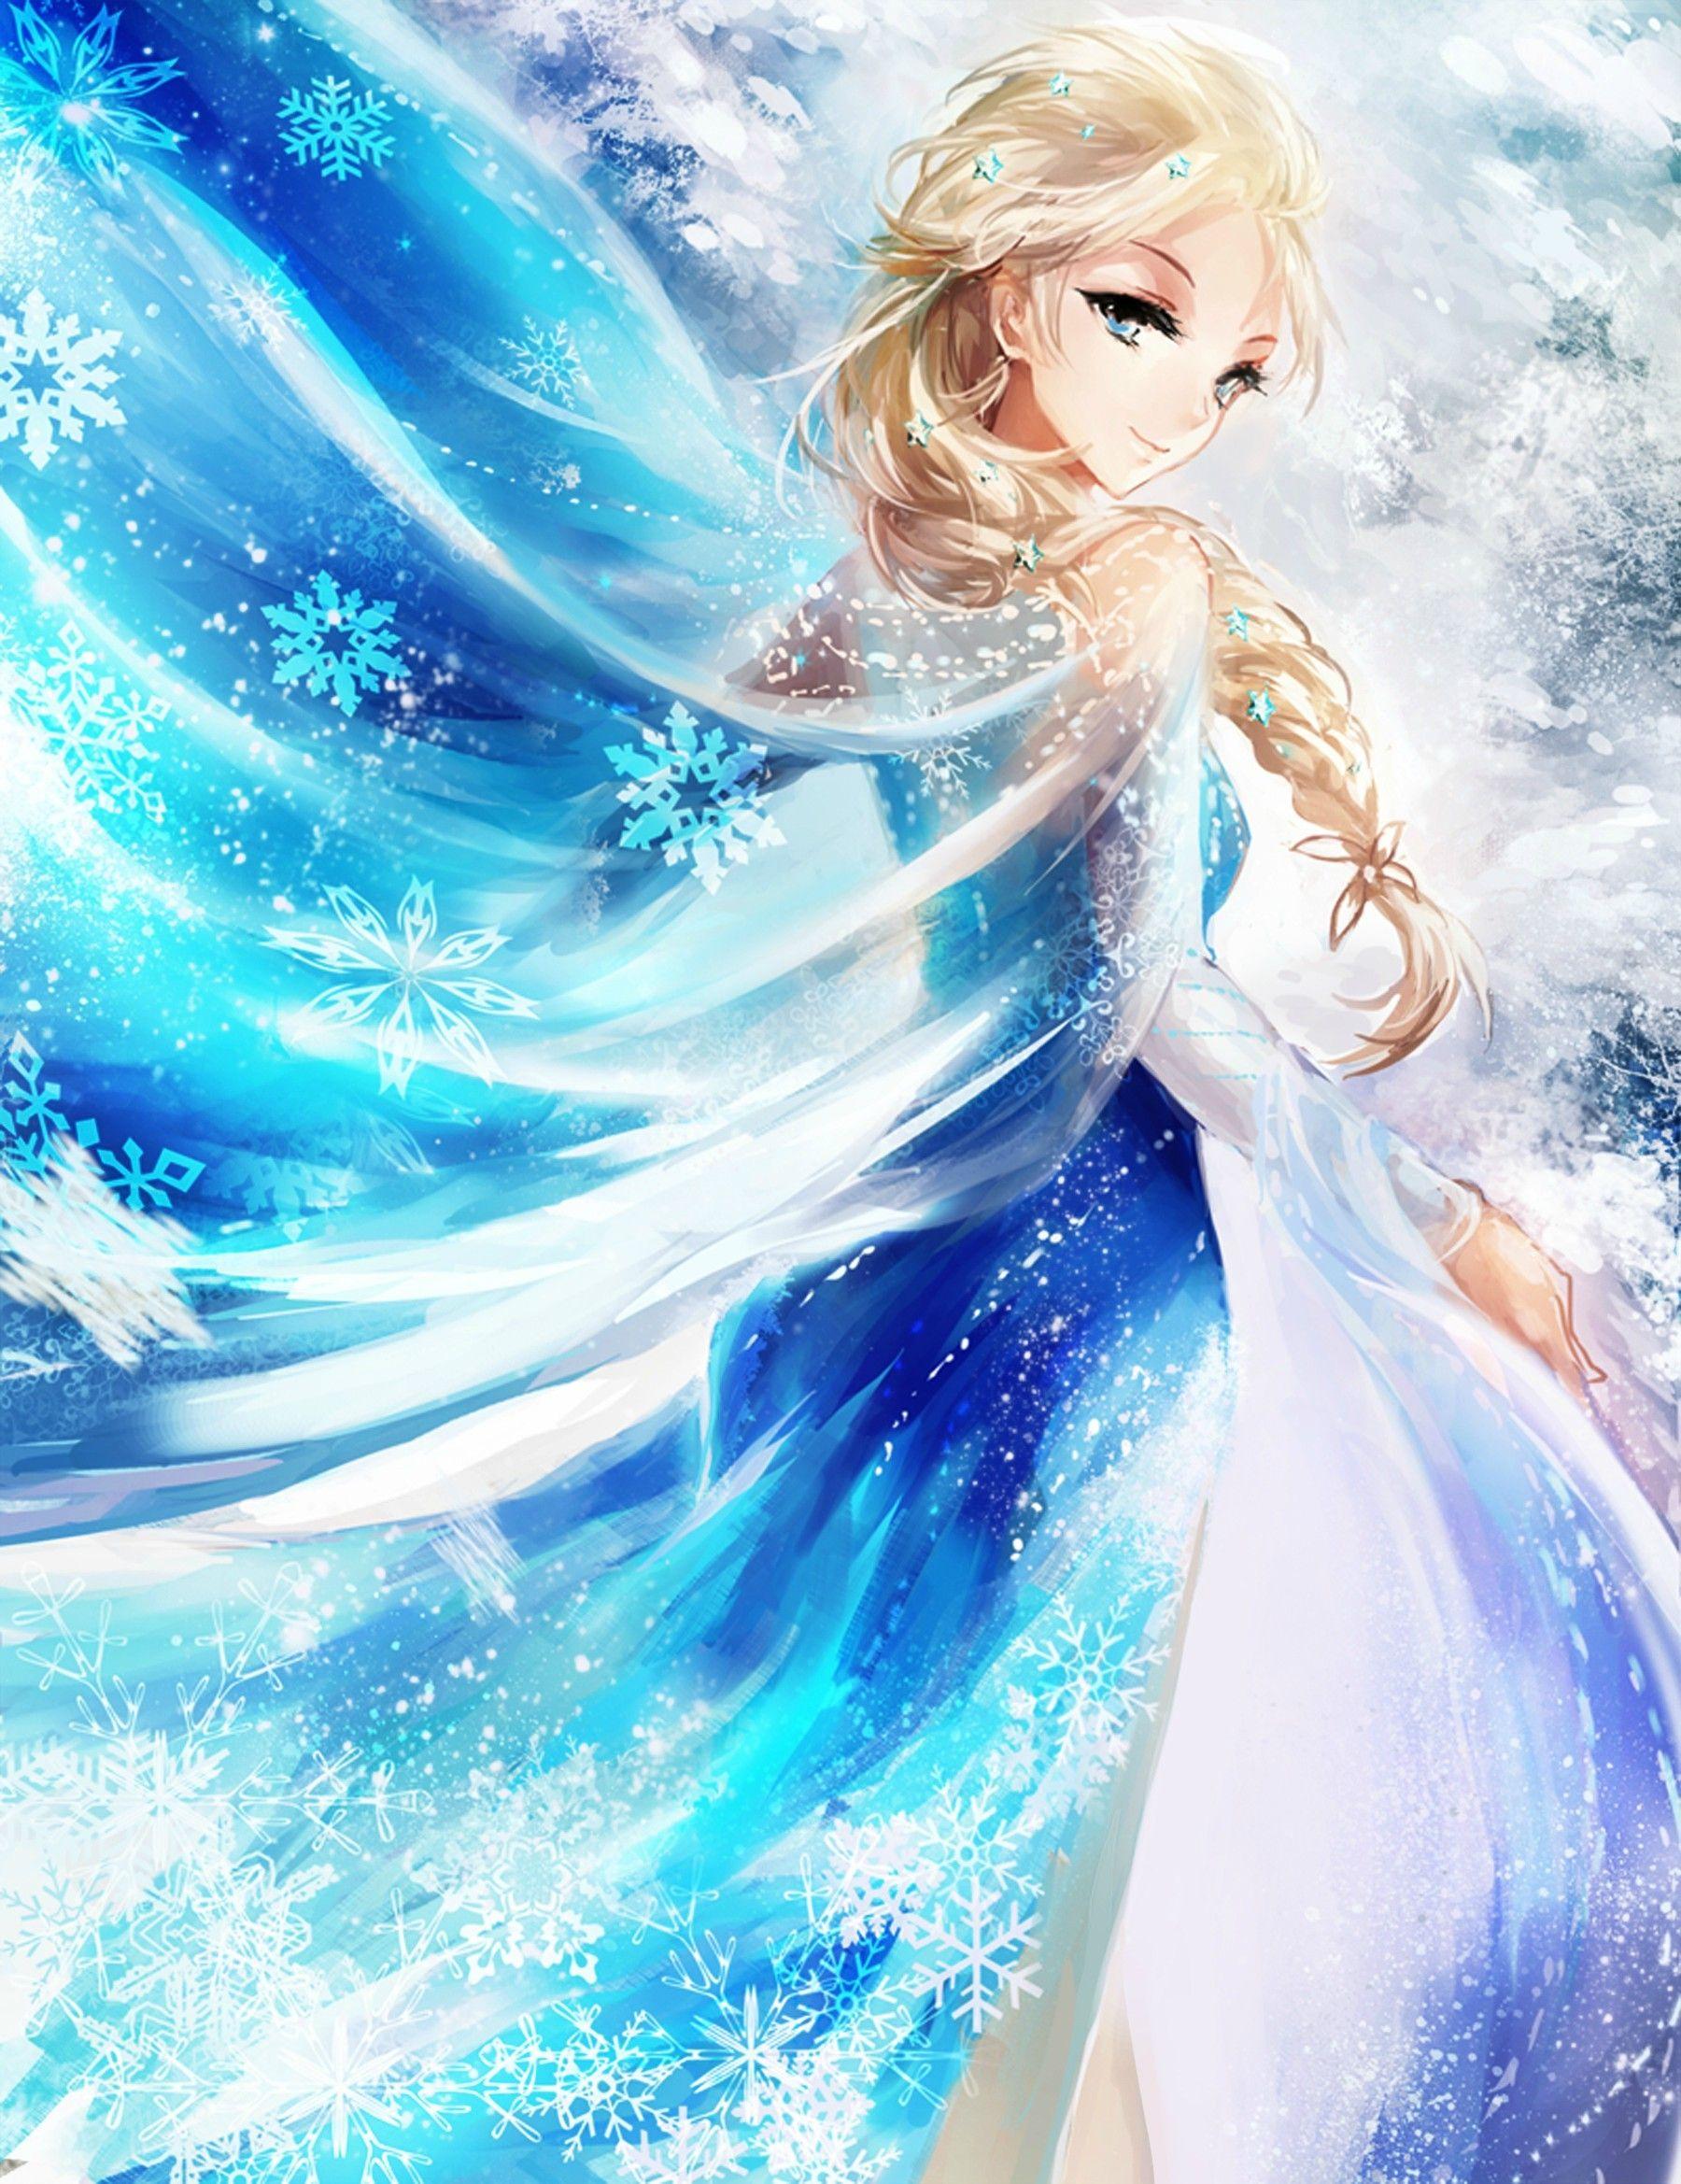 Frozens Elsa エルサ イラスト雪の女王ディズニー